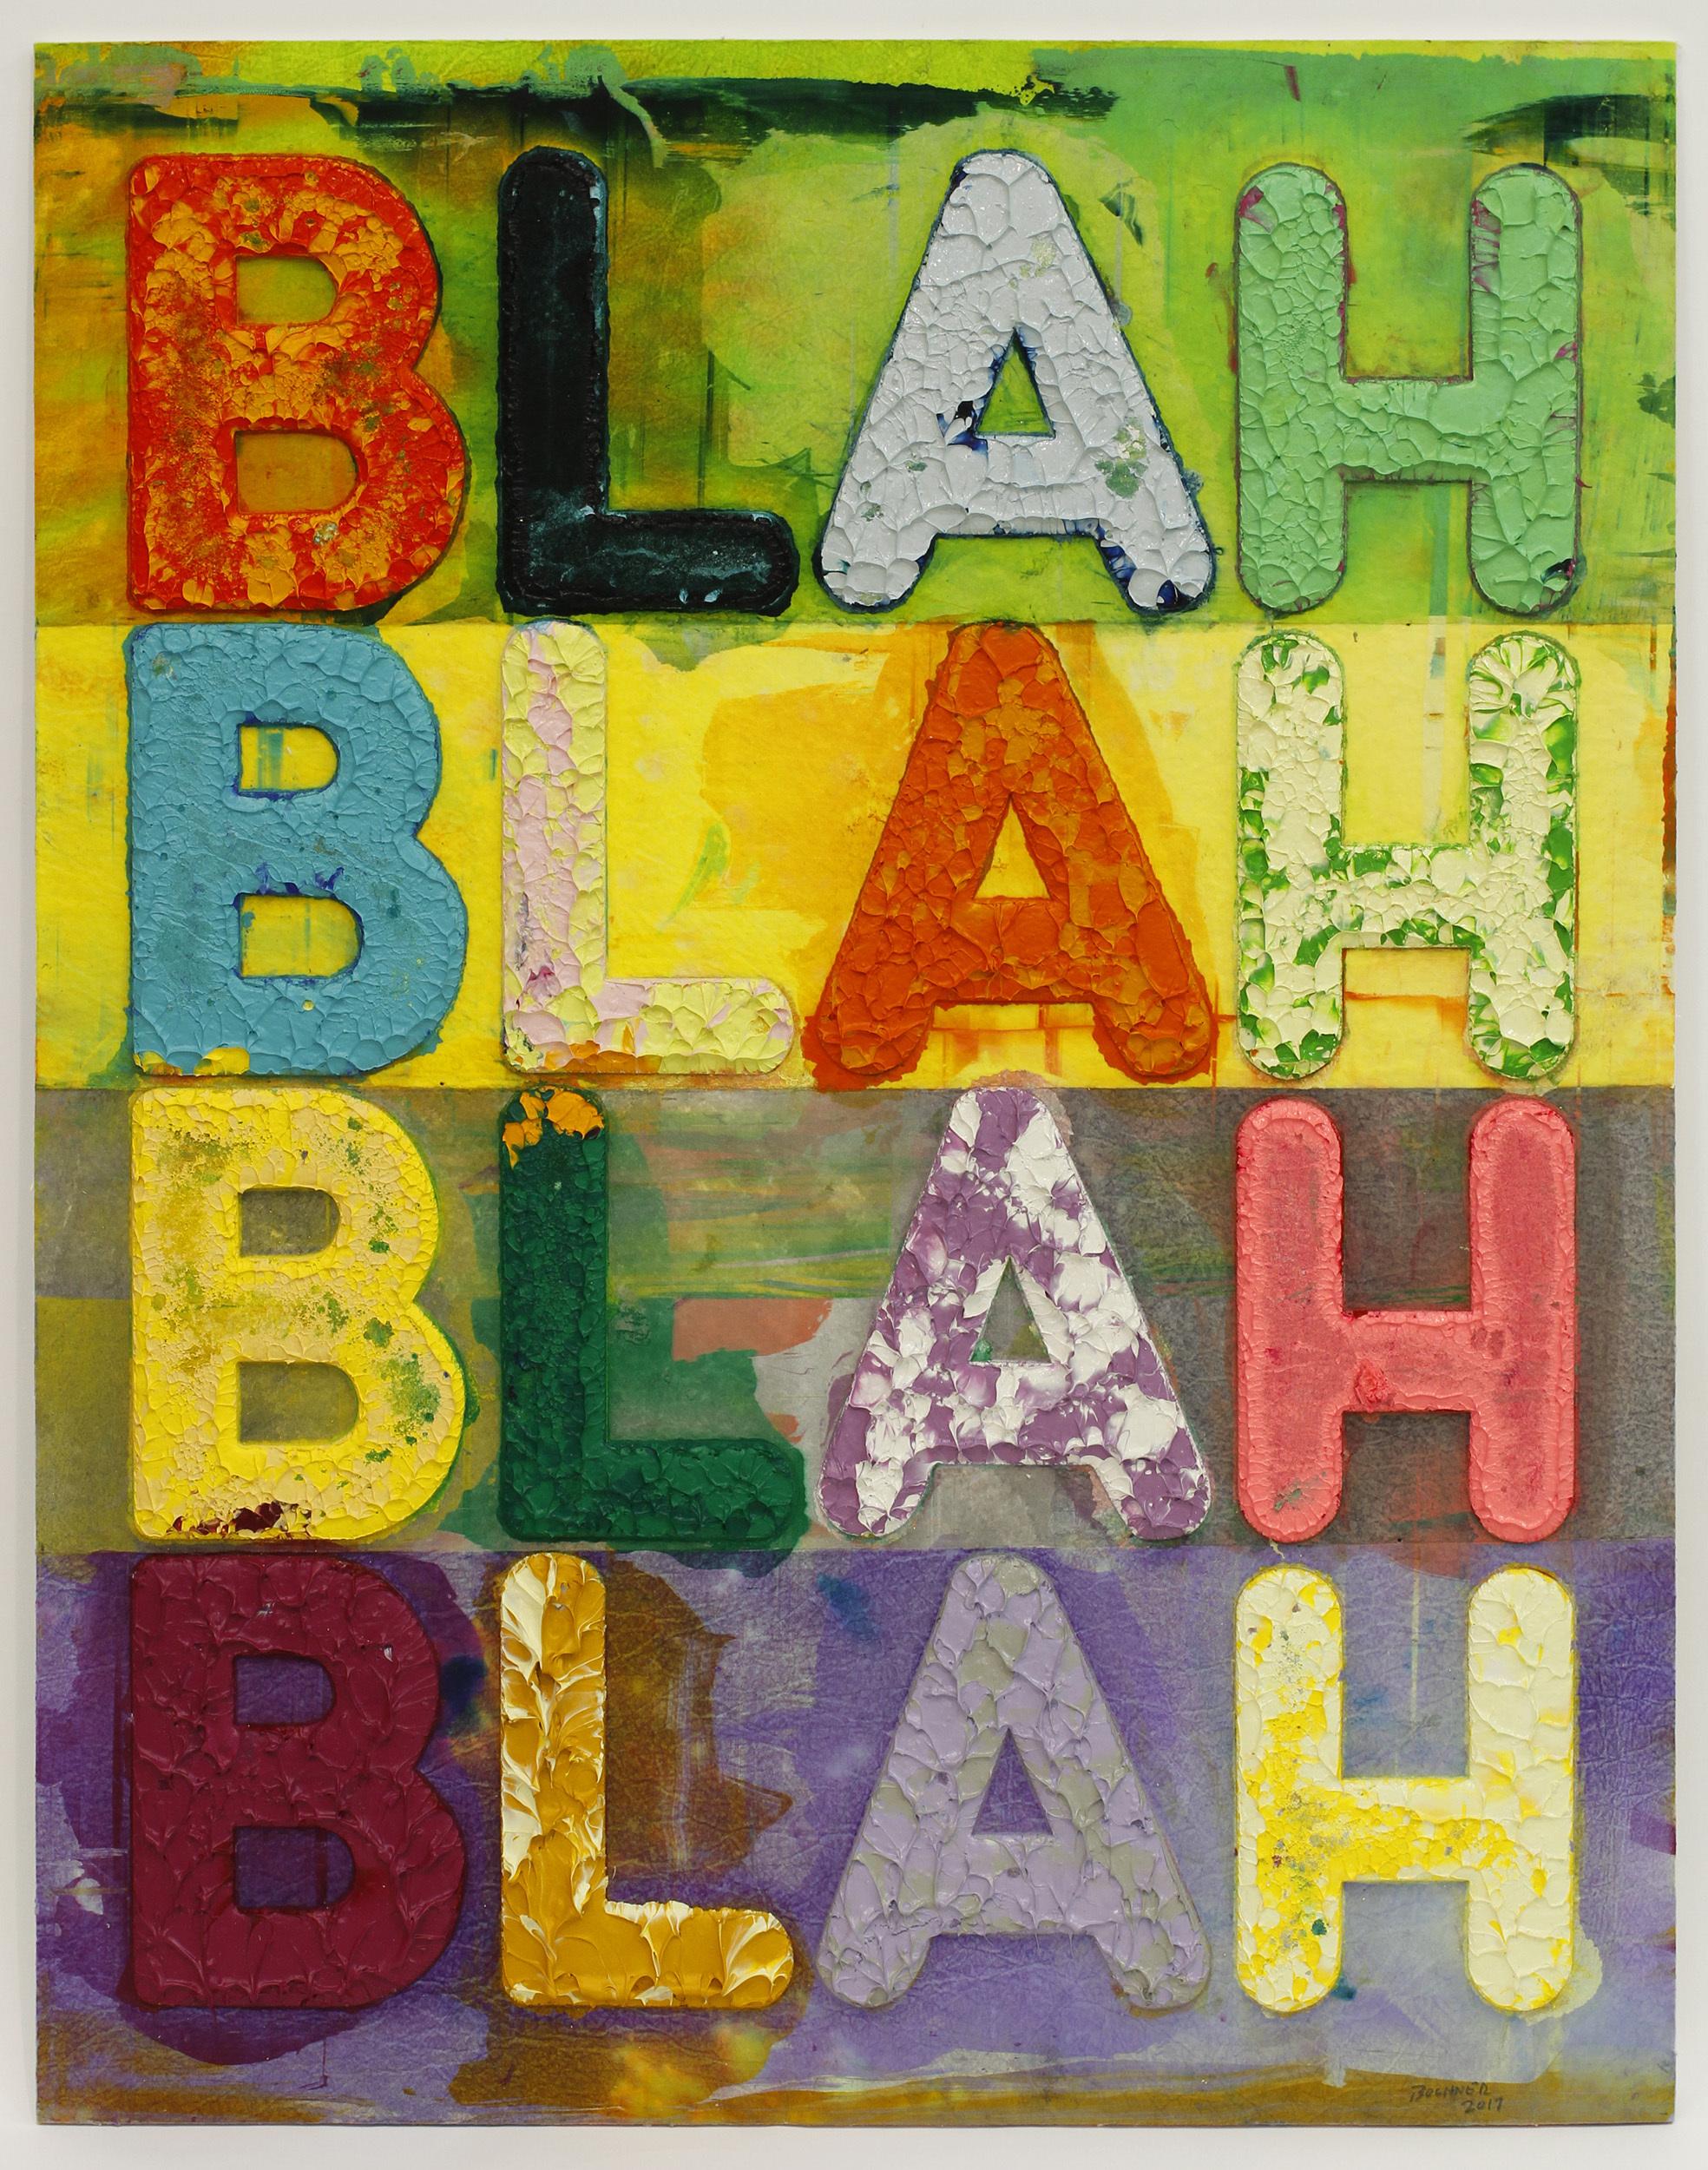 AFT2019参考出品作品 「ブラー、ブラー、ブラー、」メル・ボックナー